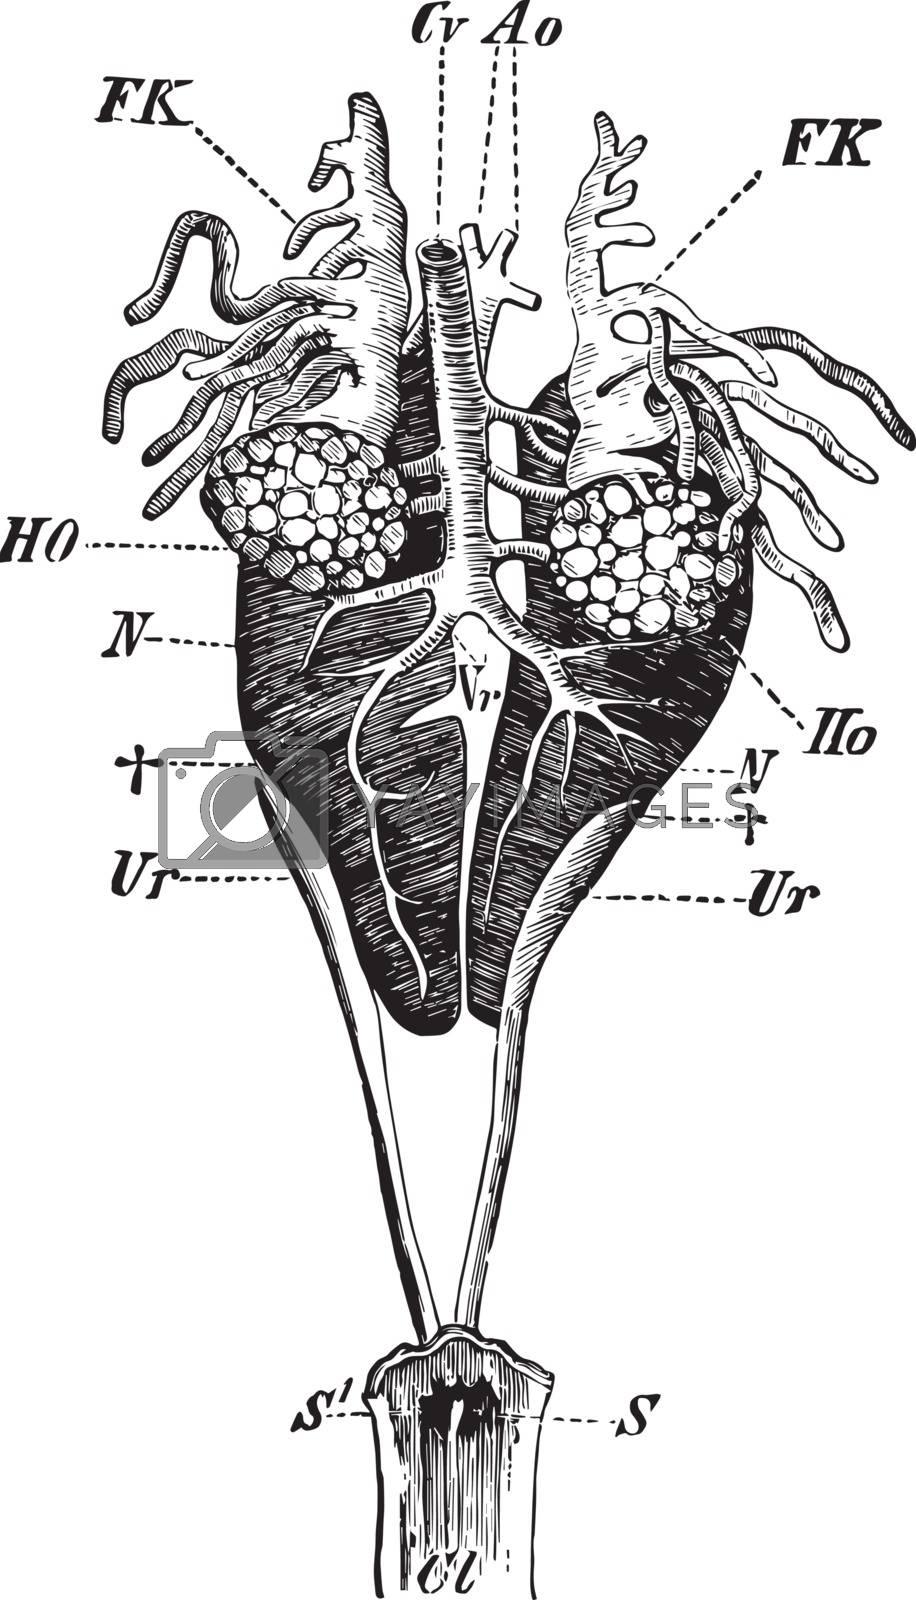 Male Edible Frog Genital Organs, vintage illustration by Morphart